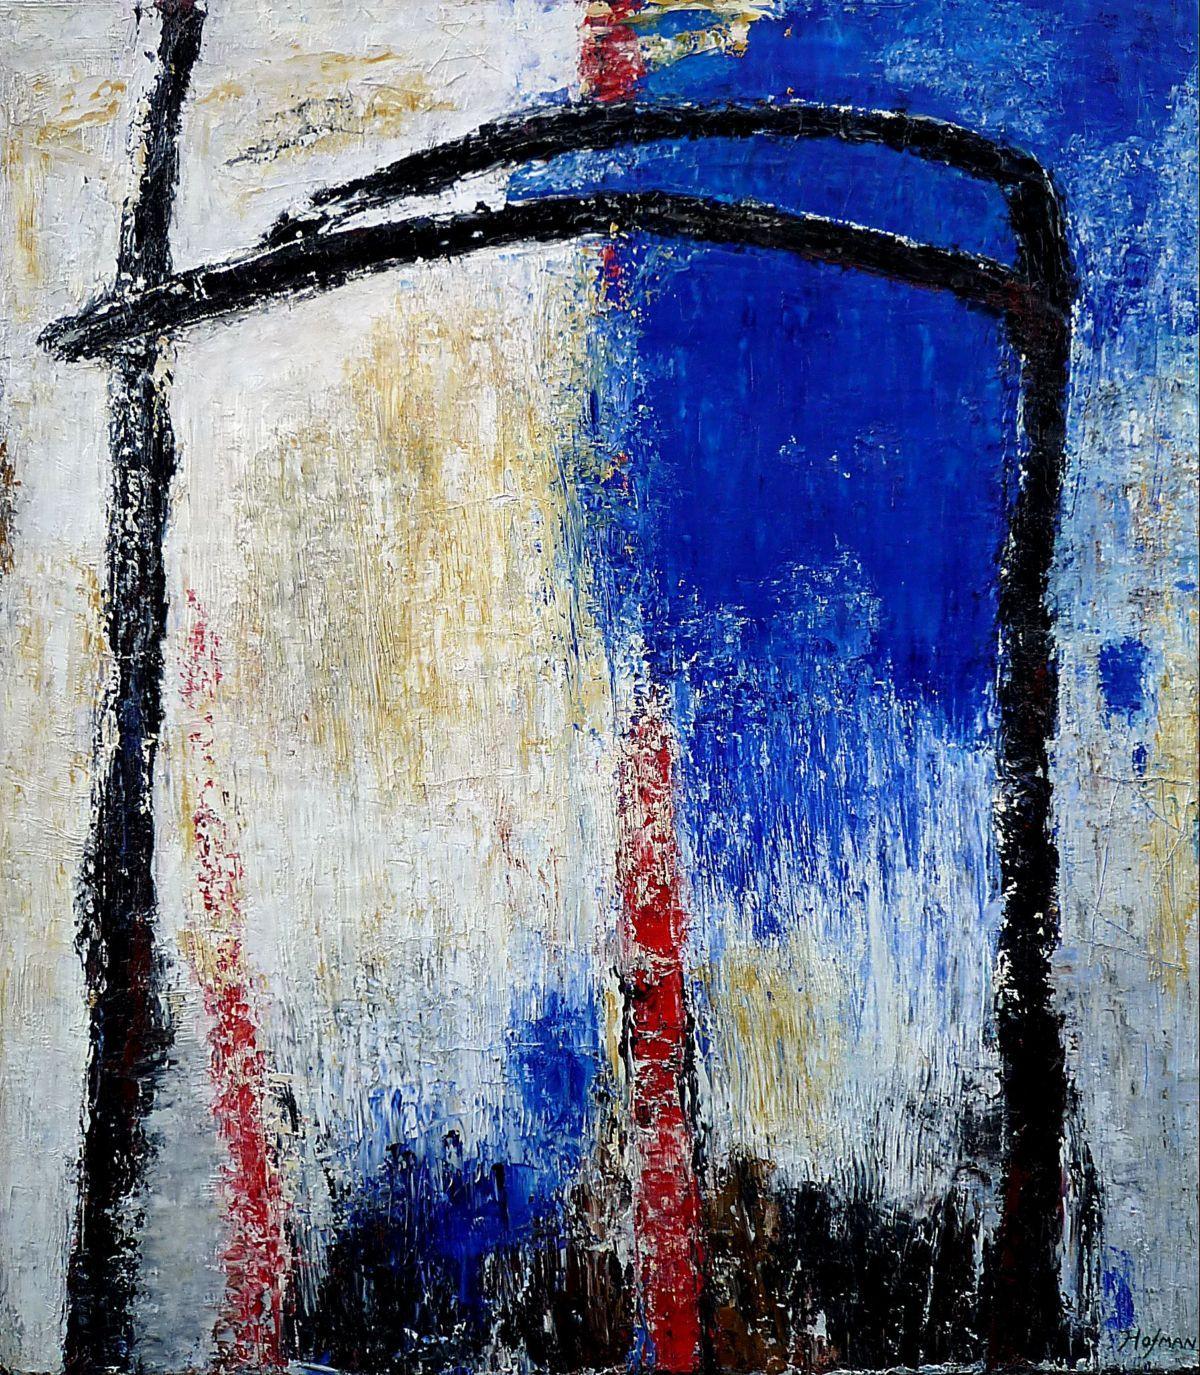 Kunst: The Blast van kunstenaar Rinus Hofman